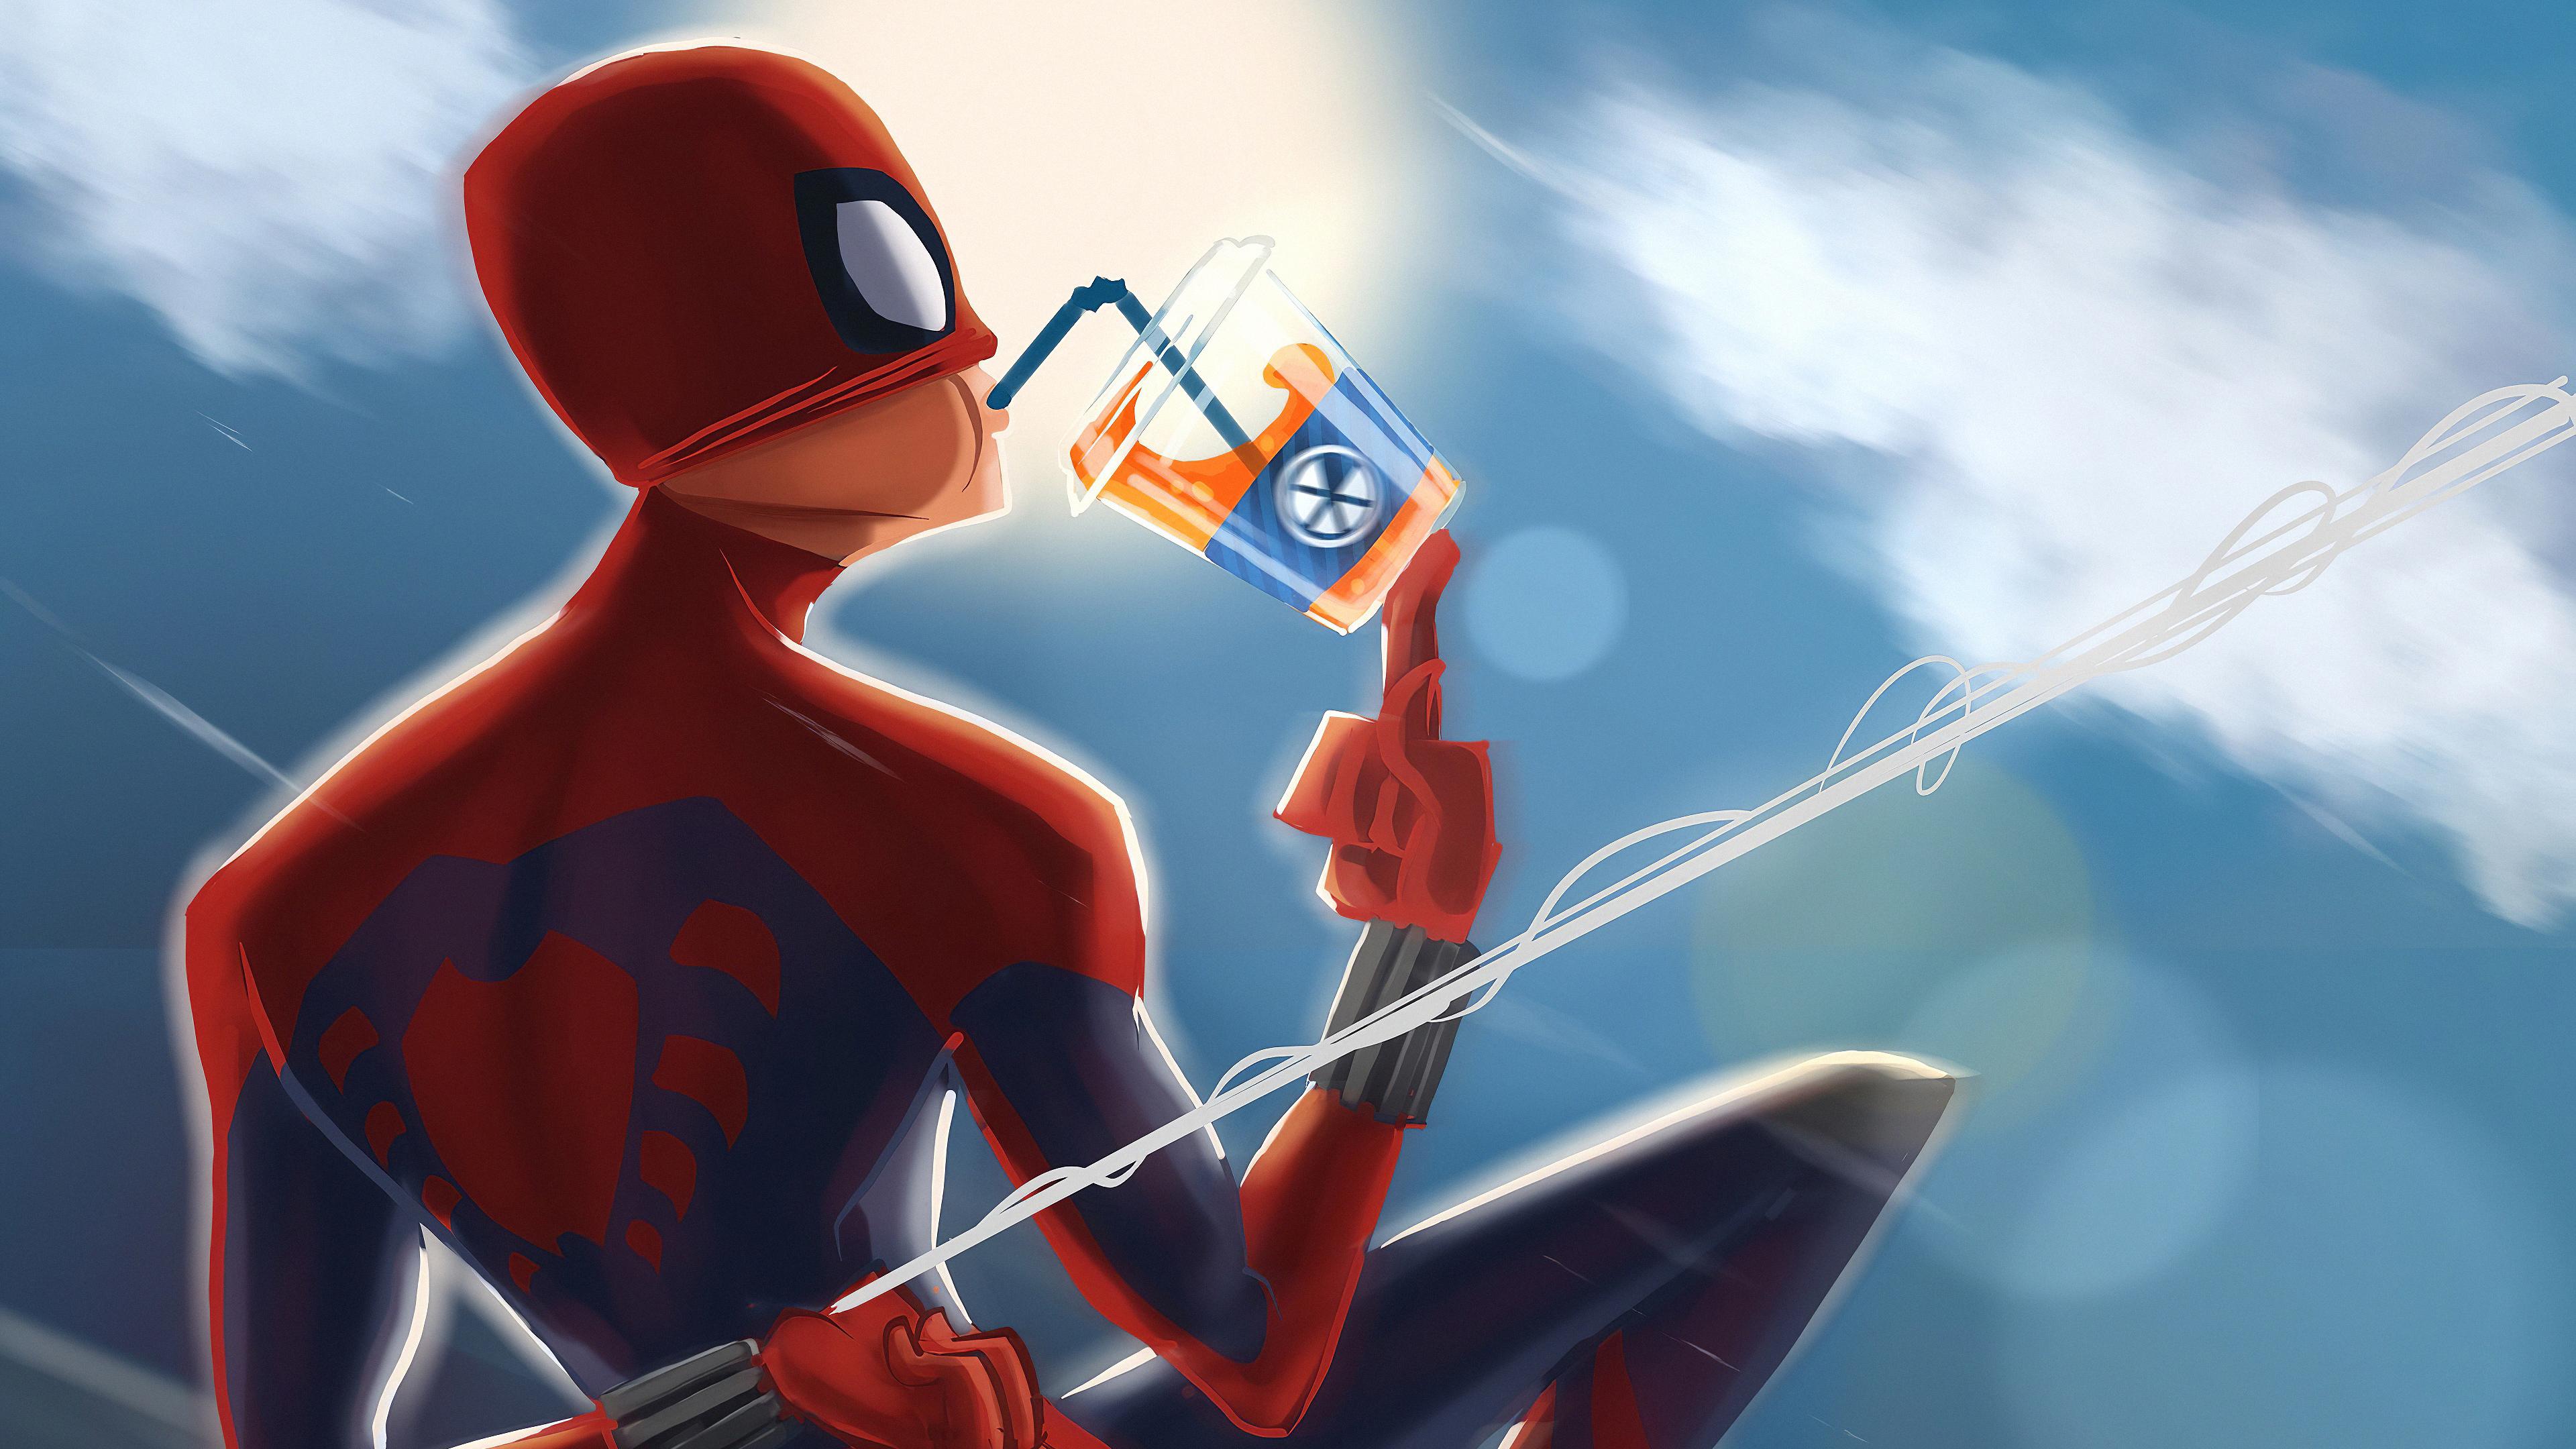 spiderman drinking juice 1576090189 - Spiderman Drinking Juice - Spiderman Drinking Juice 4k wallpaper